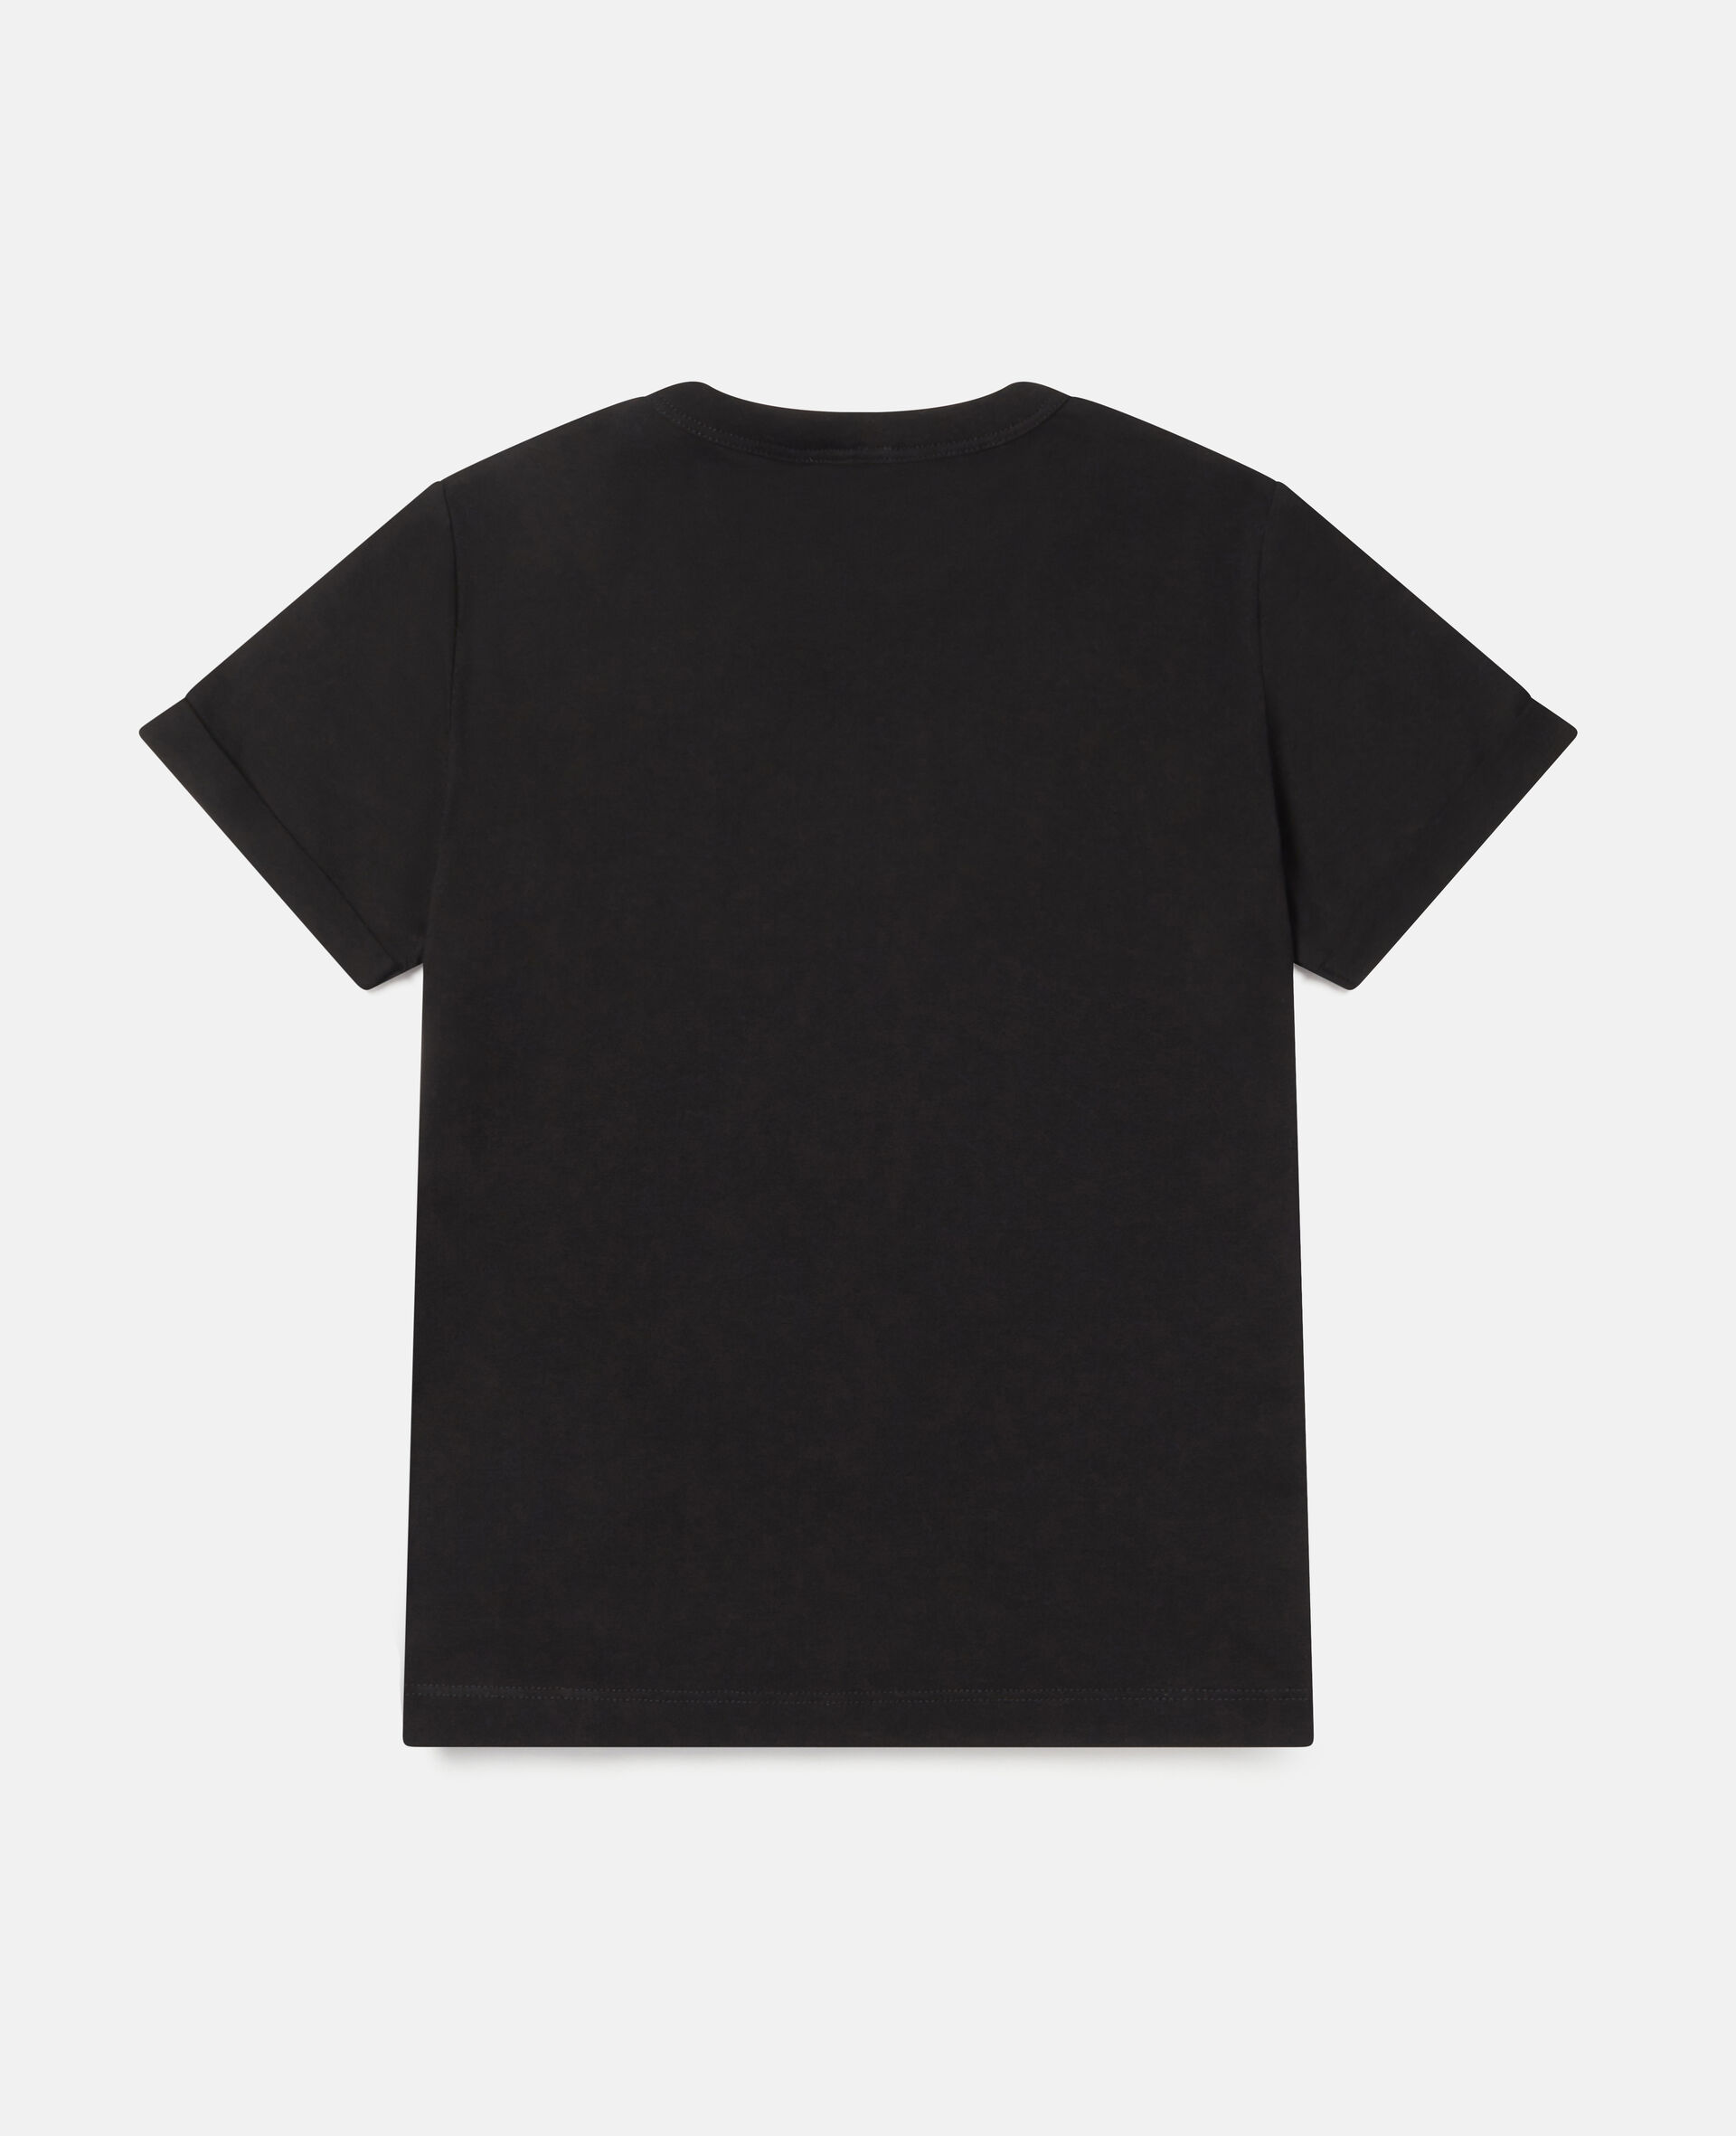 微笑爱心印花棉质 T 恤 -黑色-large image number 3